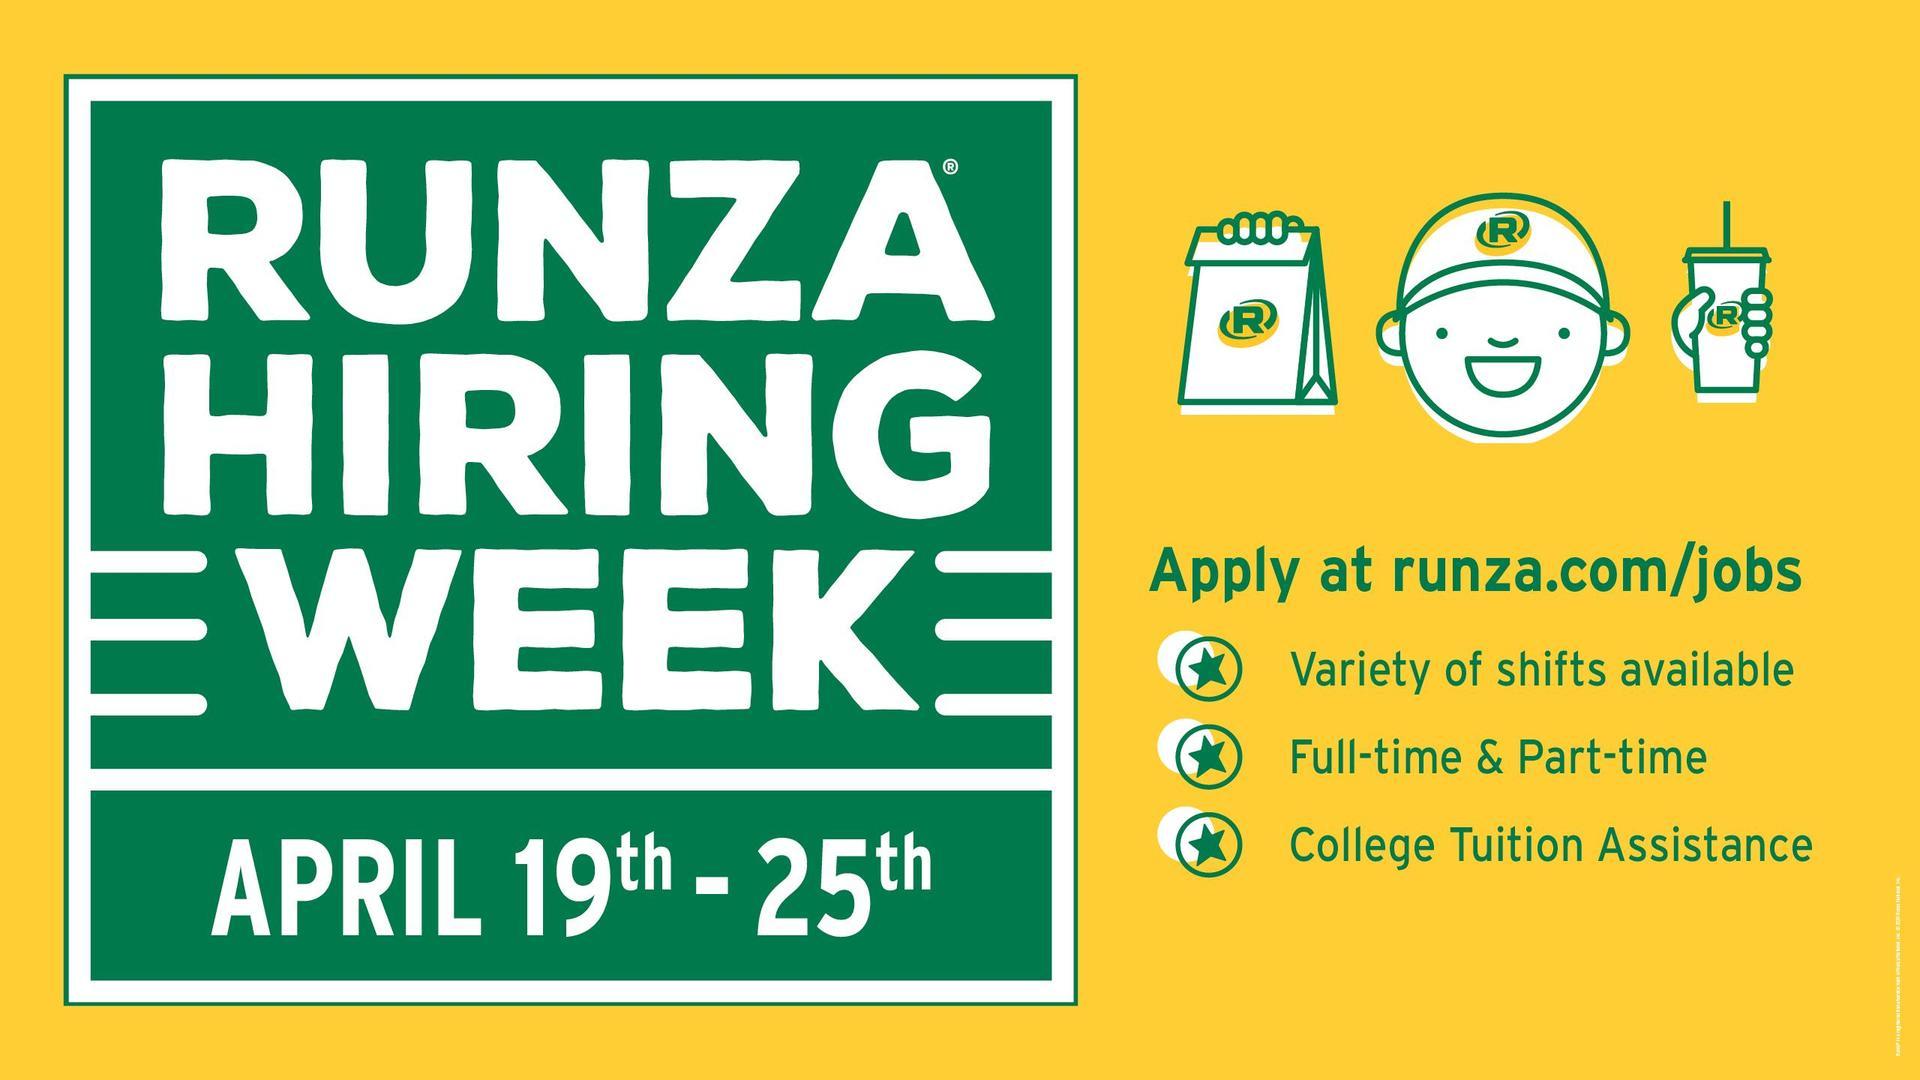 RUNZA Hiring Week